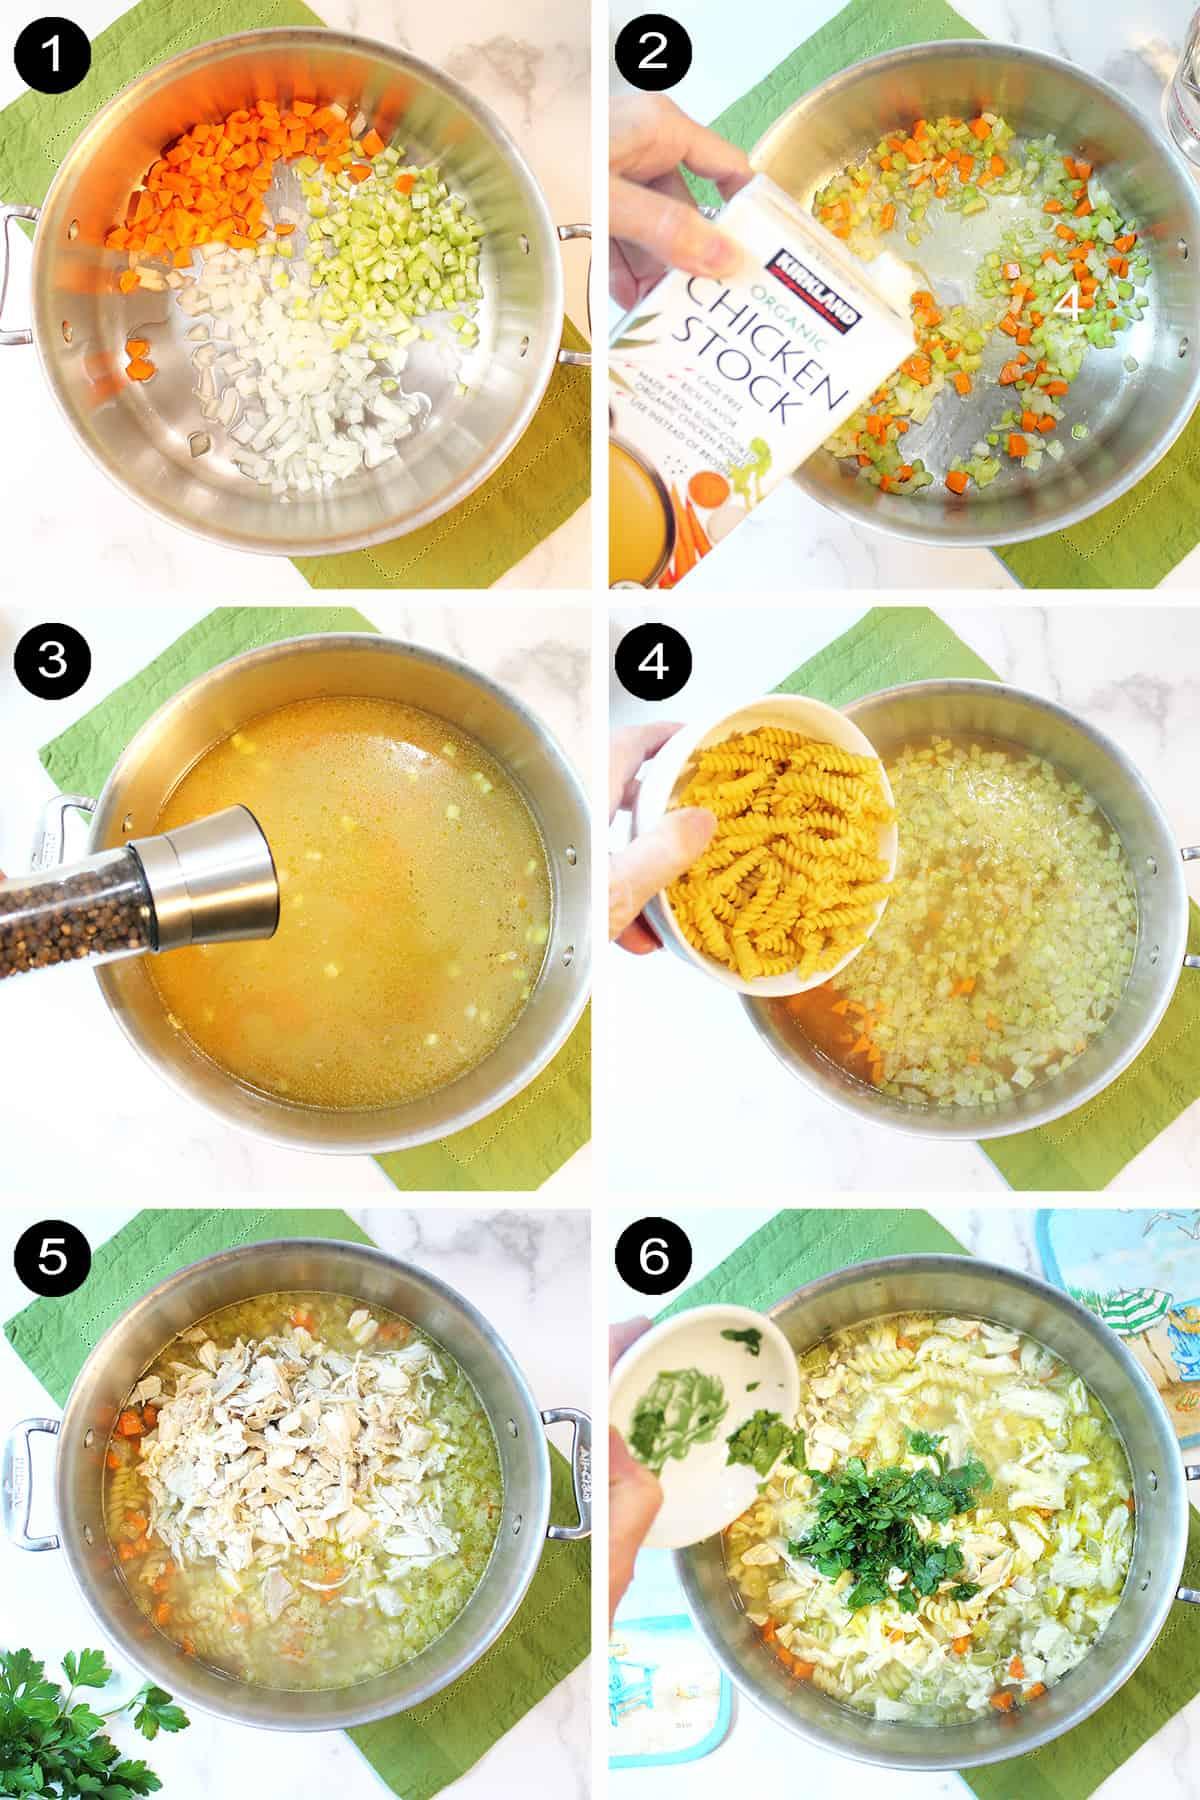 Prep steps to make homemade soup.